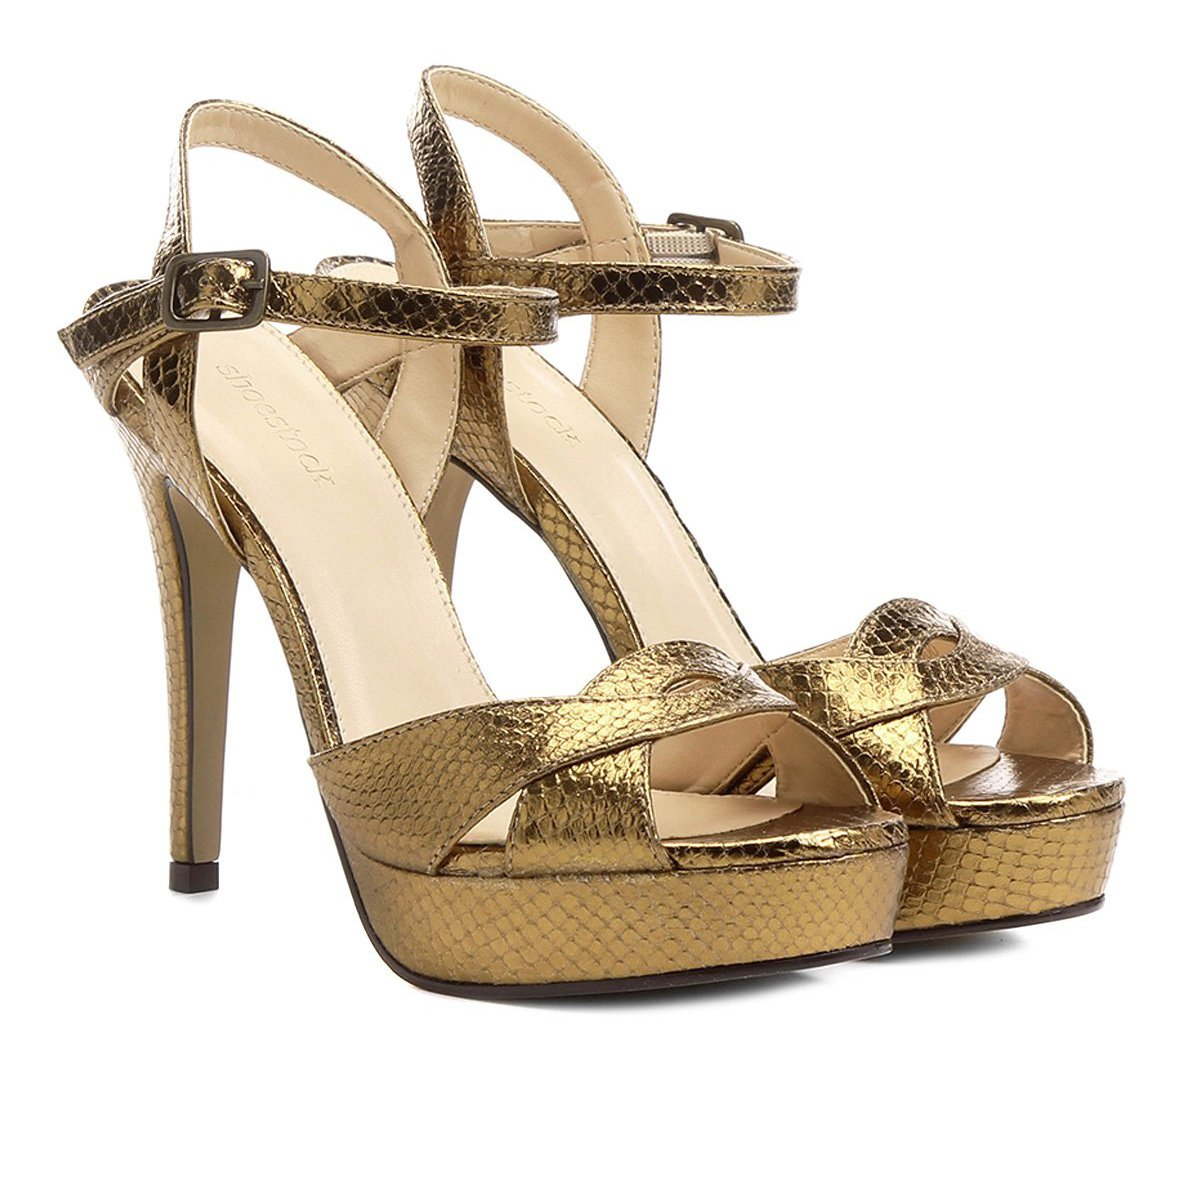 0058caa1b Sandália Couro Shoestock Meia Pata Metalizada Feminina | Shoestock